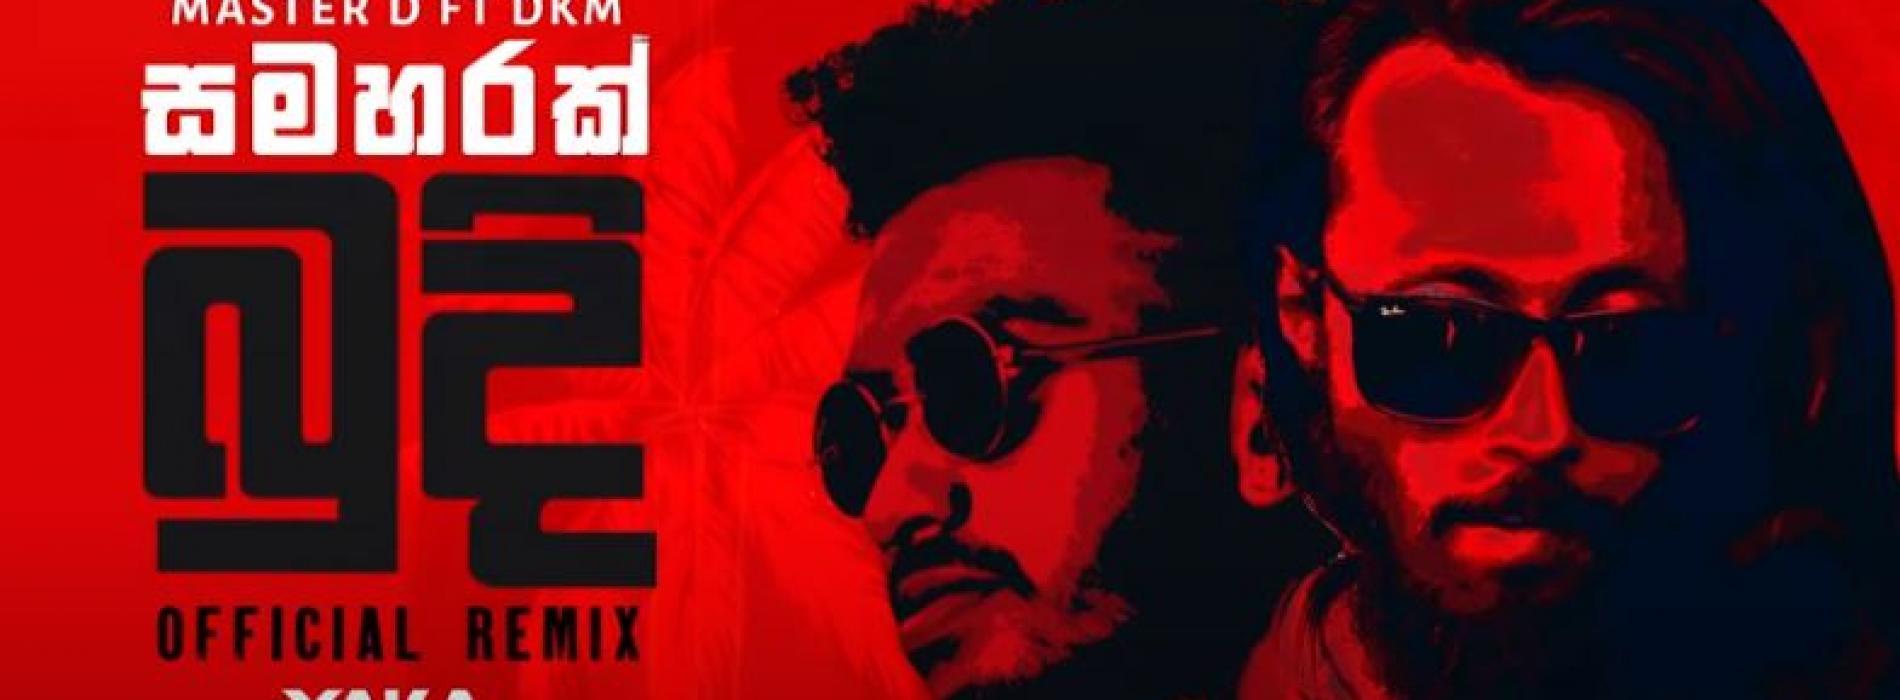 MasterD – Samaharak Budi (සමහරක් බුදී) ft DKM (Official Remix)by YAKA